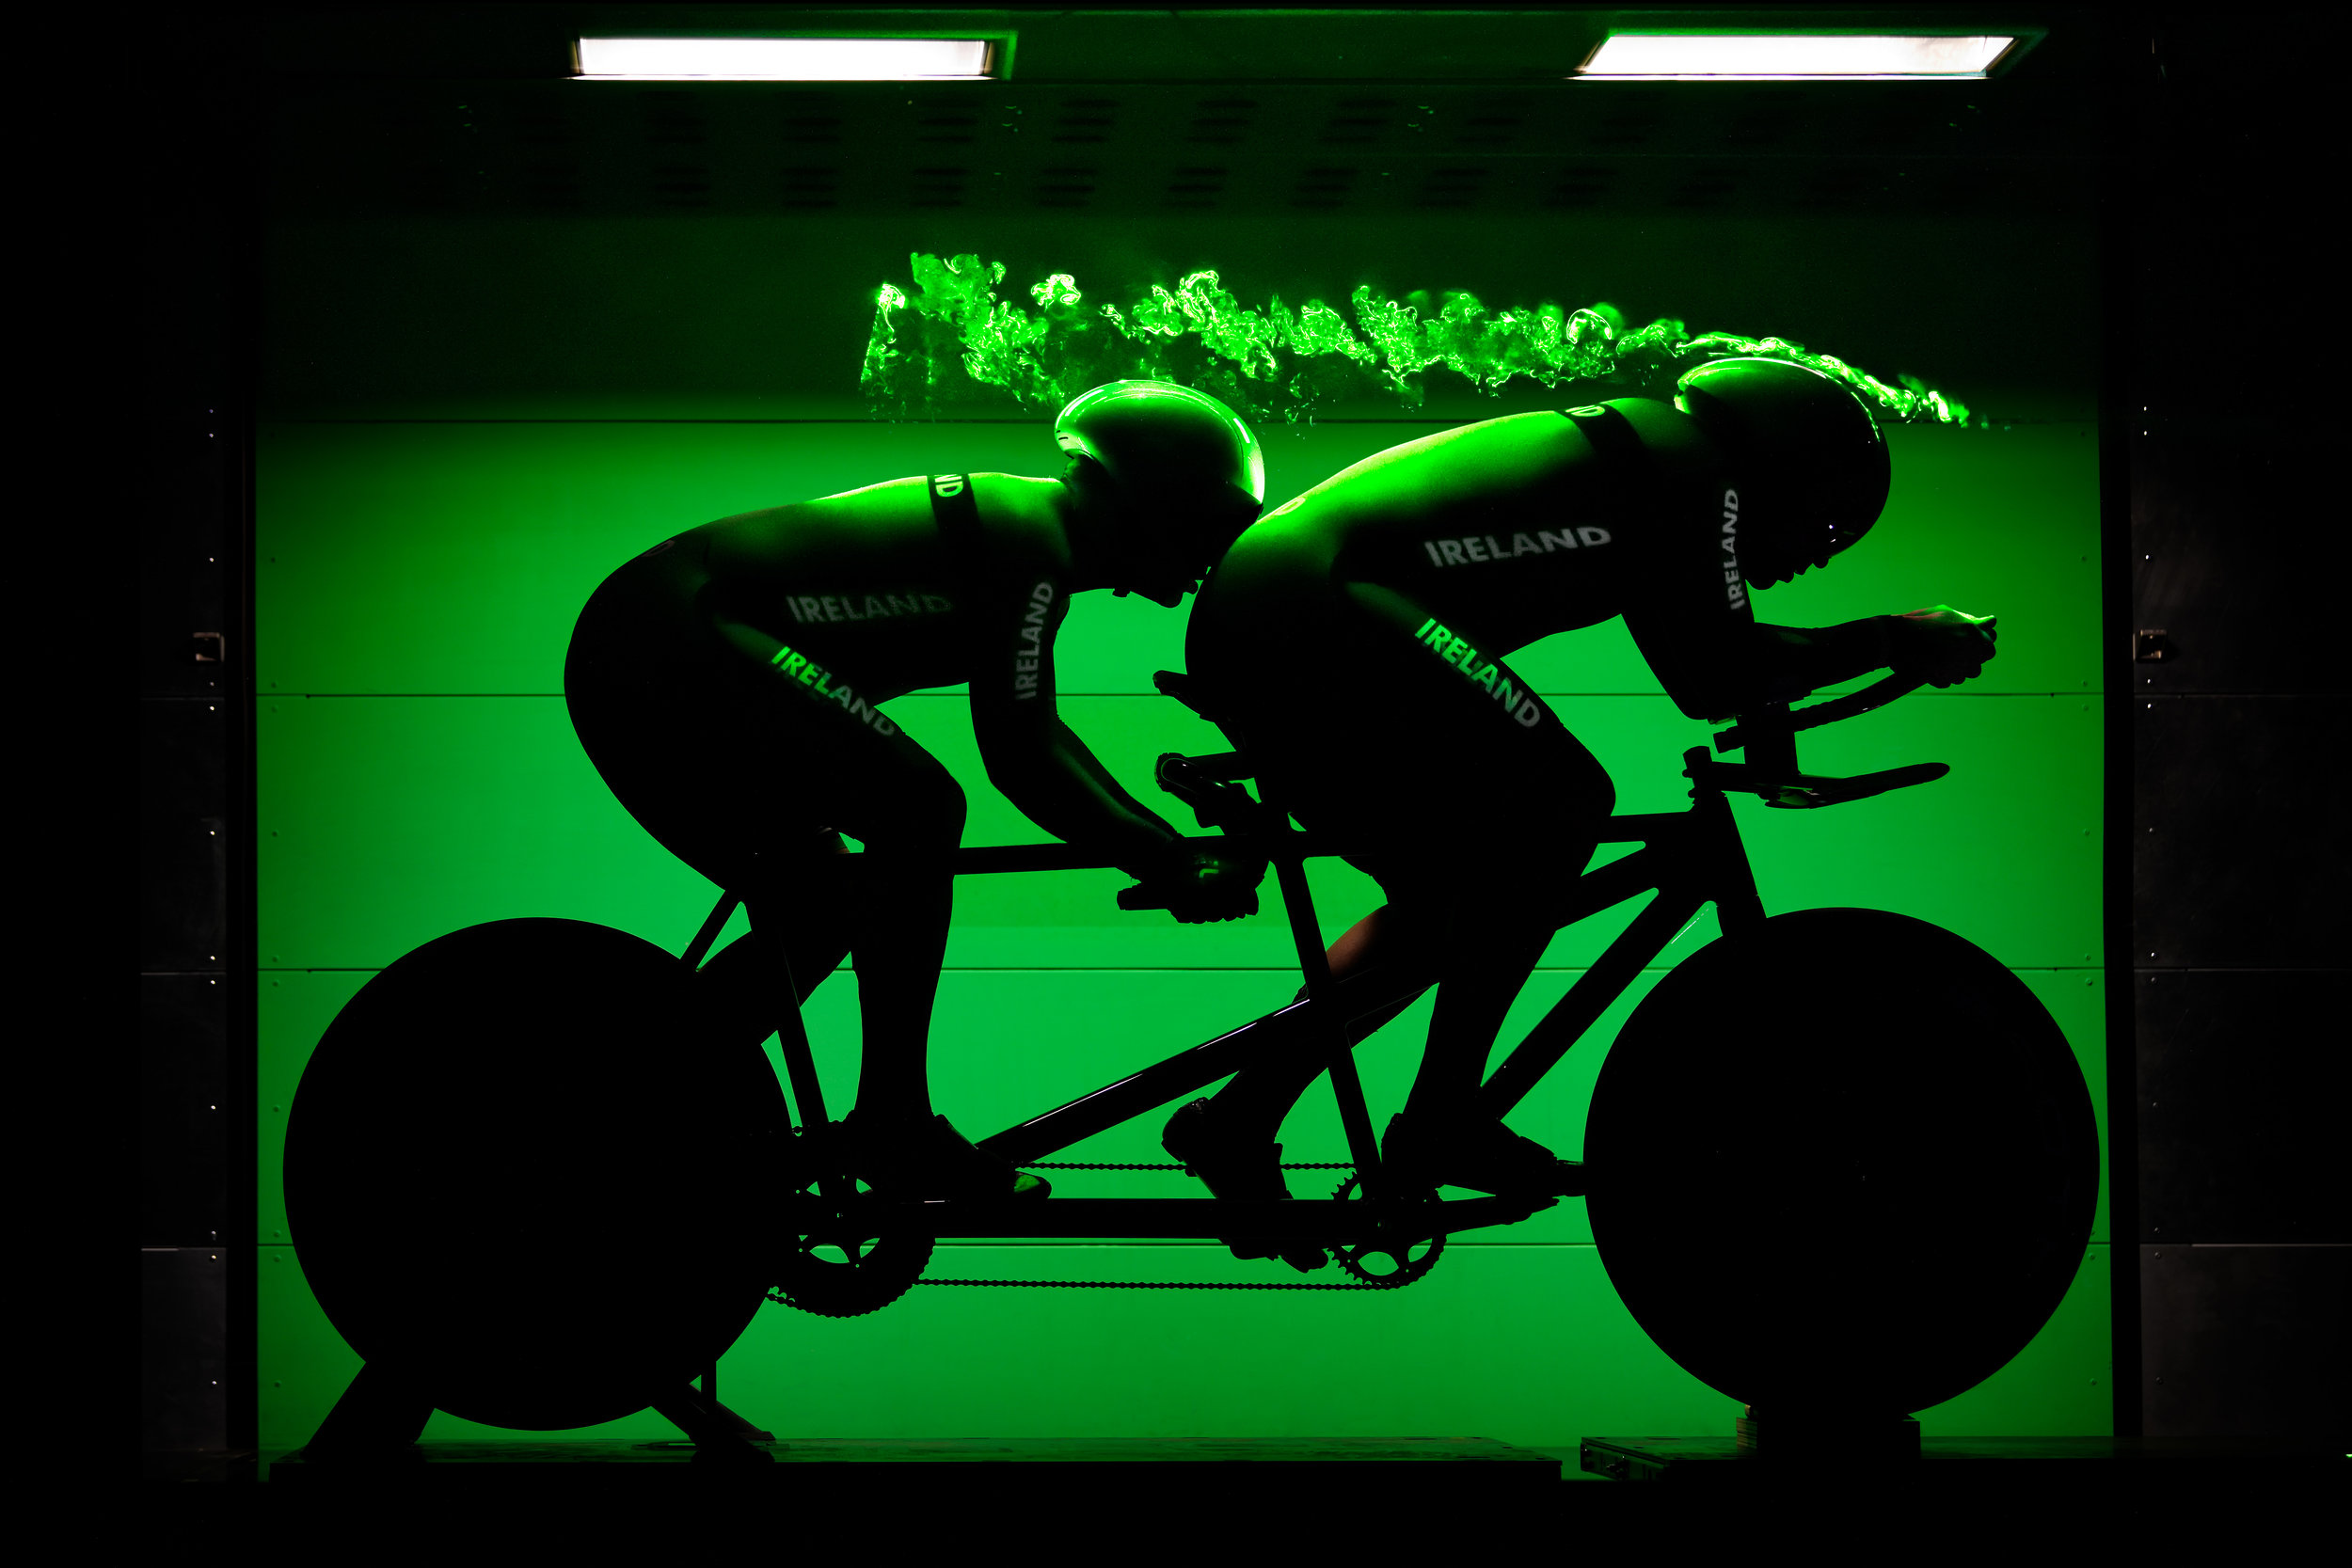 BvOF Irish para-cycling sprint team in windtunnel TU Eindhoven 1.jpg